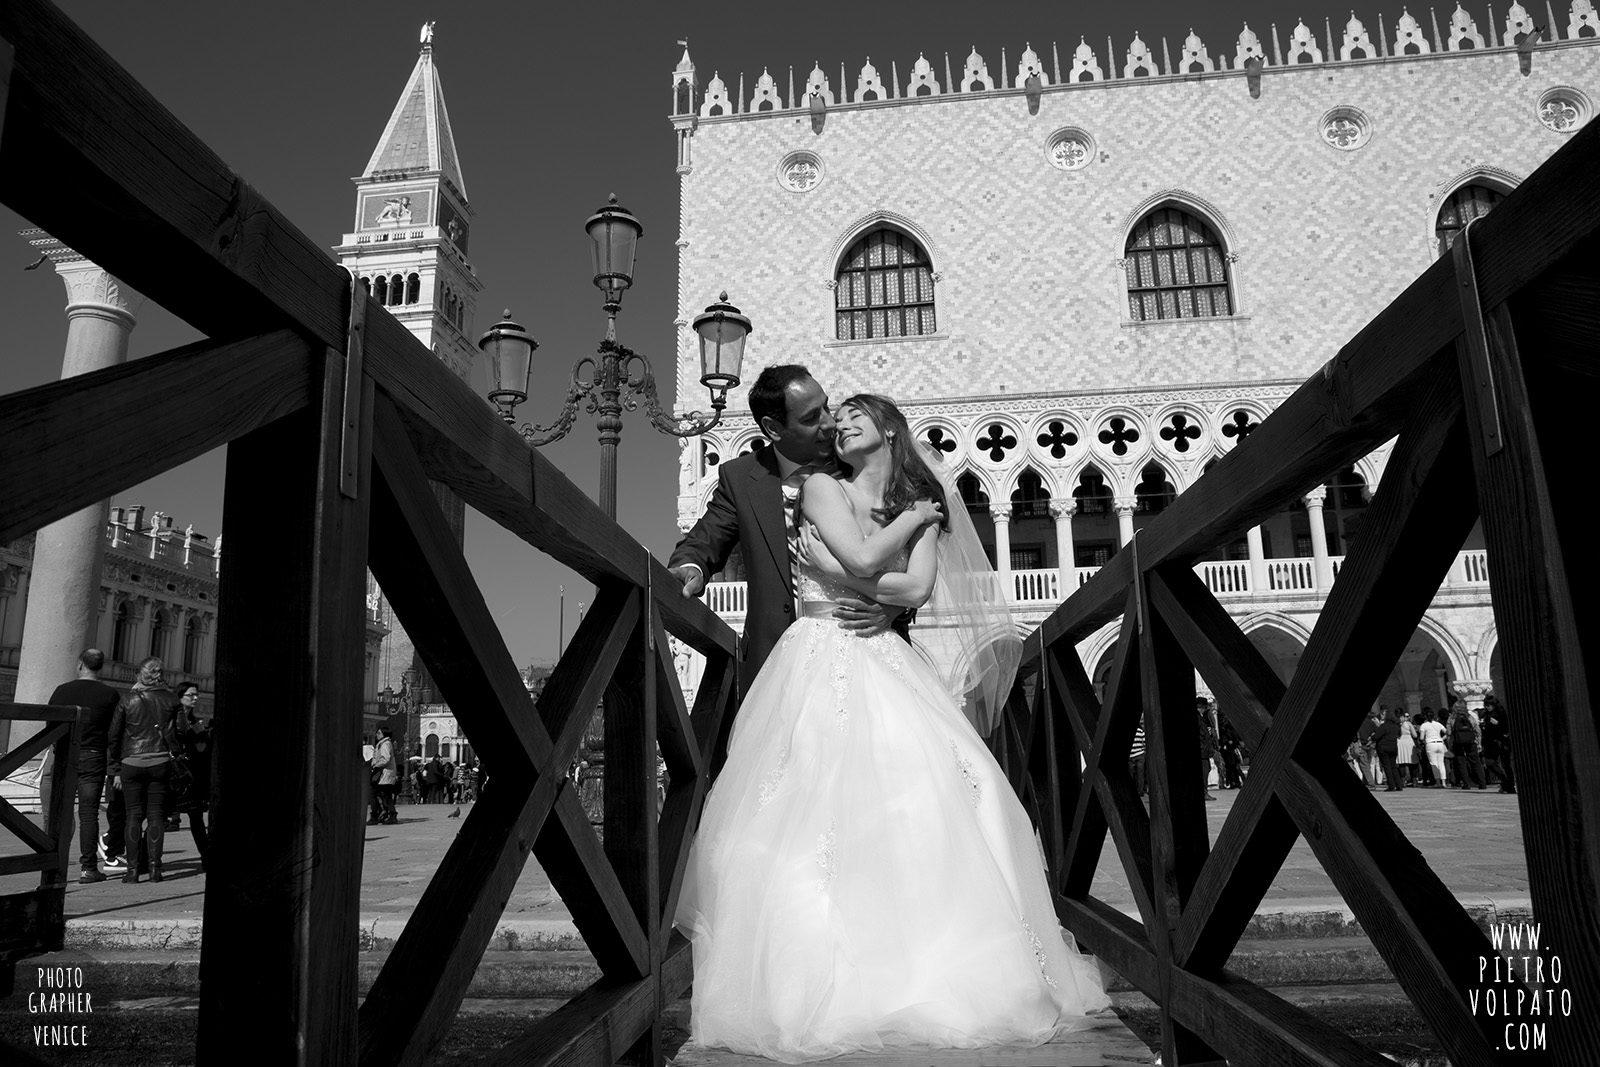 venice-wedding-honeymoon-photographer-20140312_02